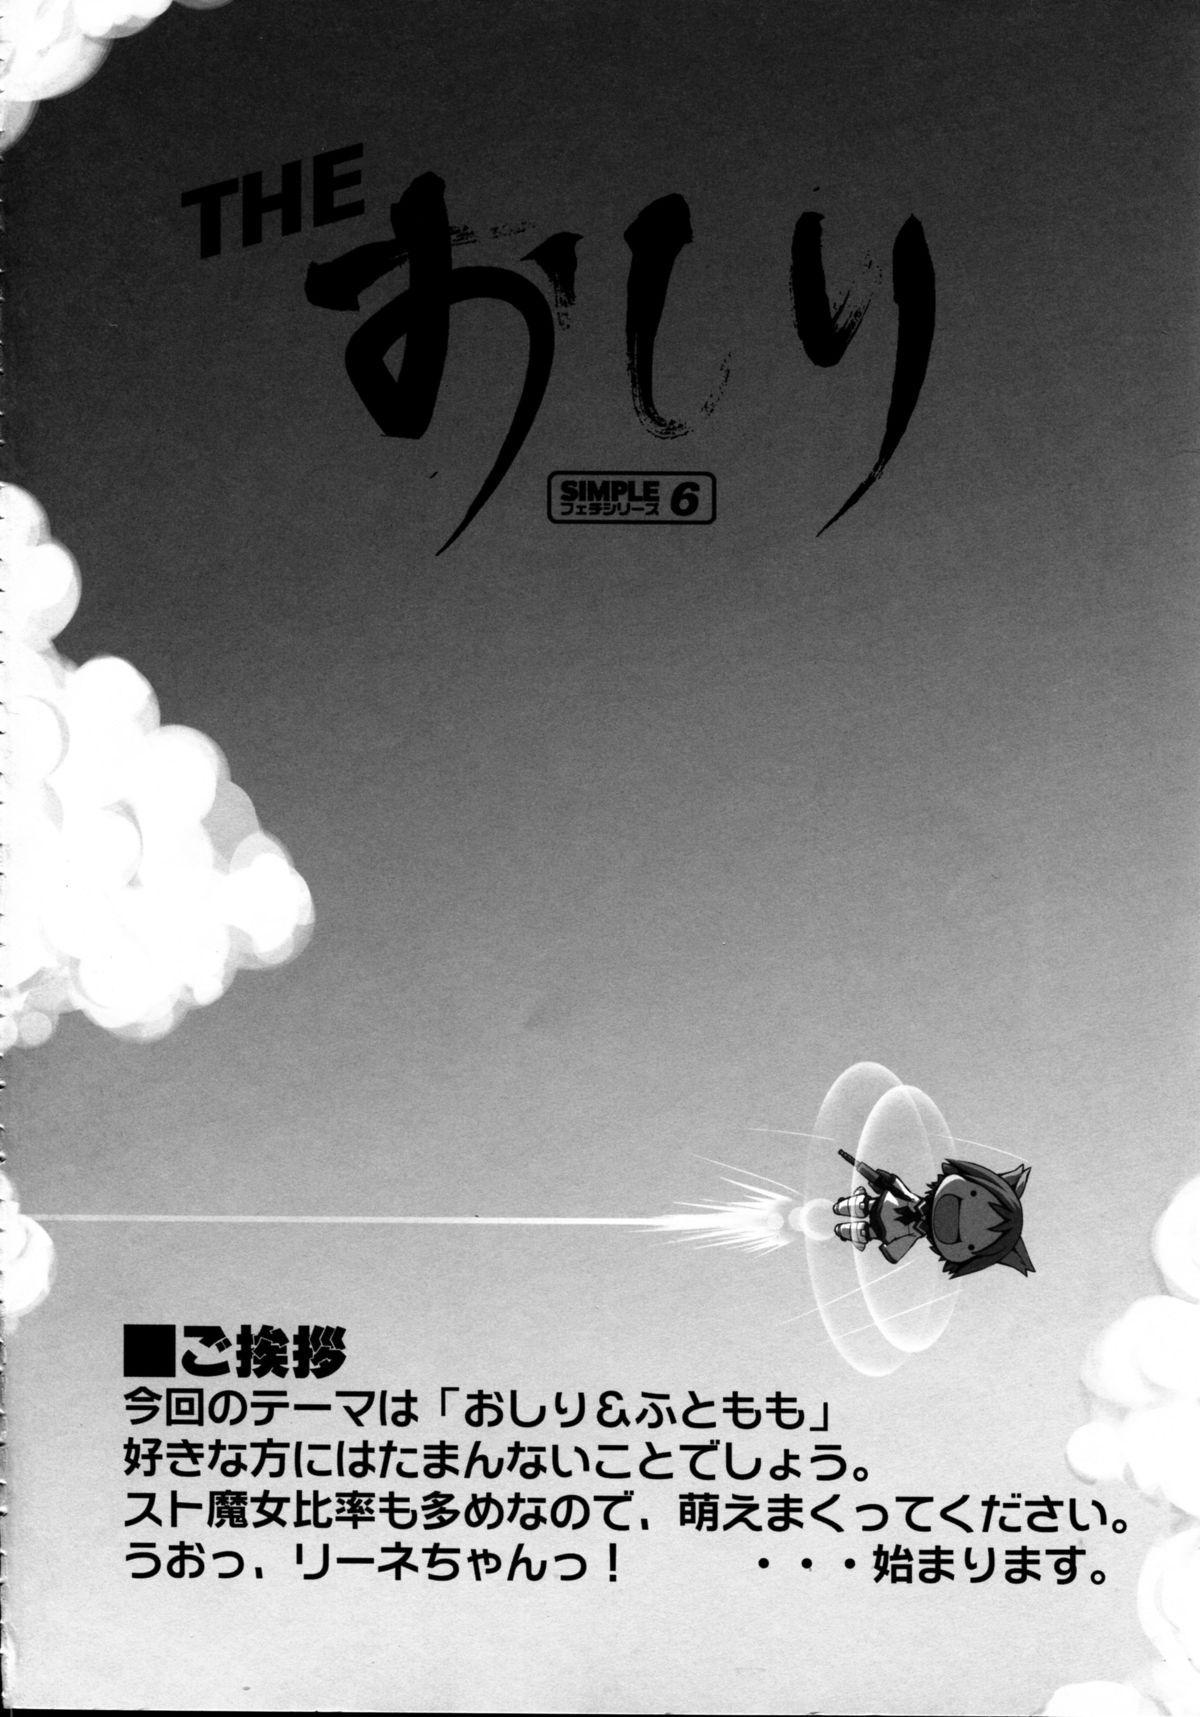 THE Oshiri 3